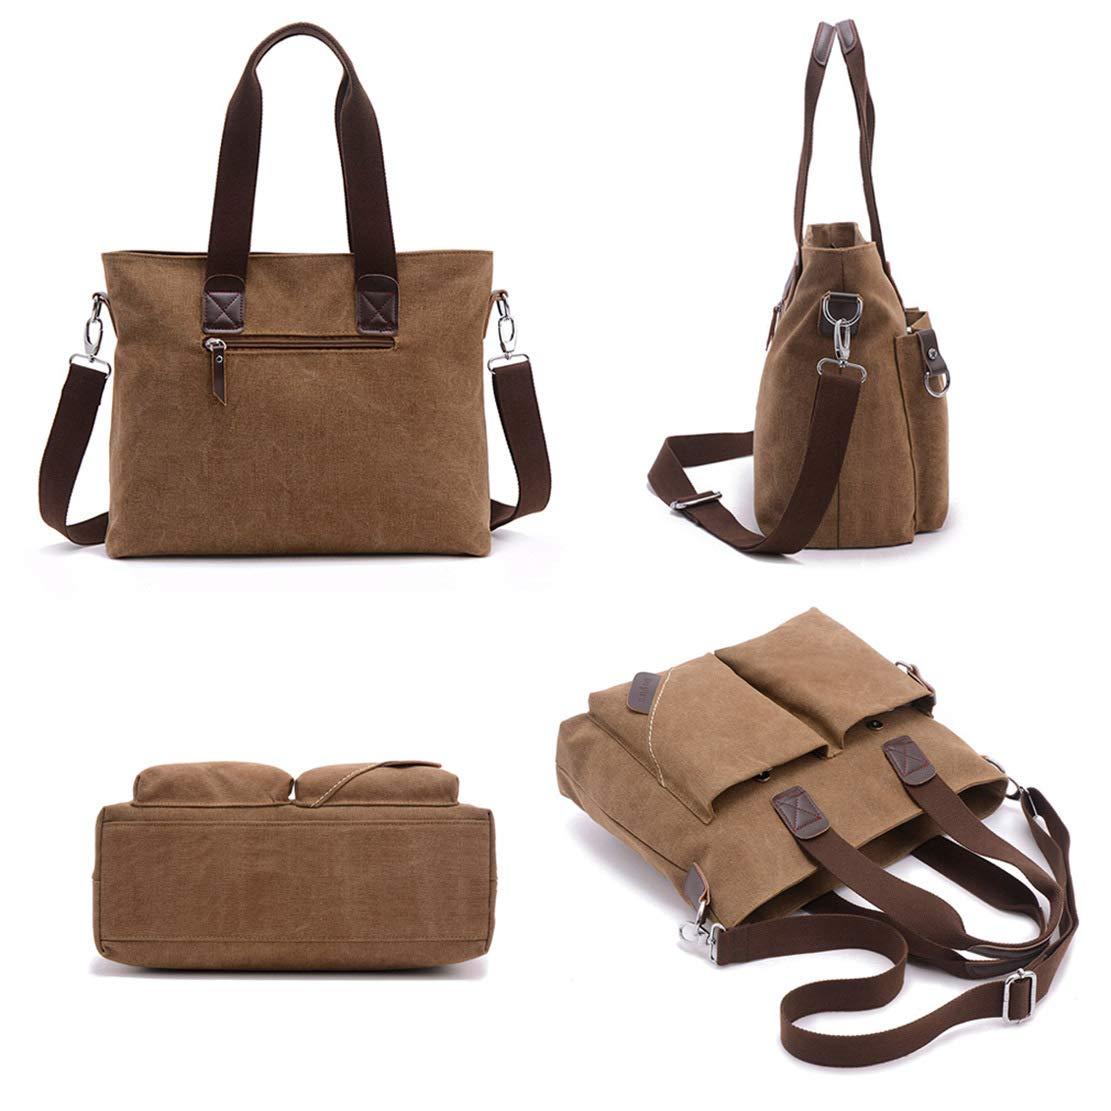 ToLFE Women Top Handle Satchel Handbags Tote Purse Shoulder Bag (Khaki-(Large)) by ToLFE (Image #4)